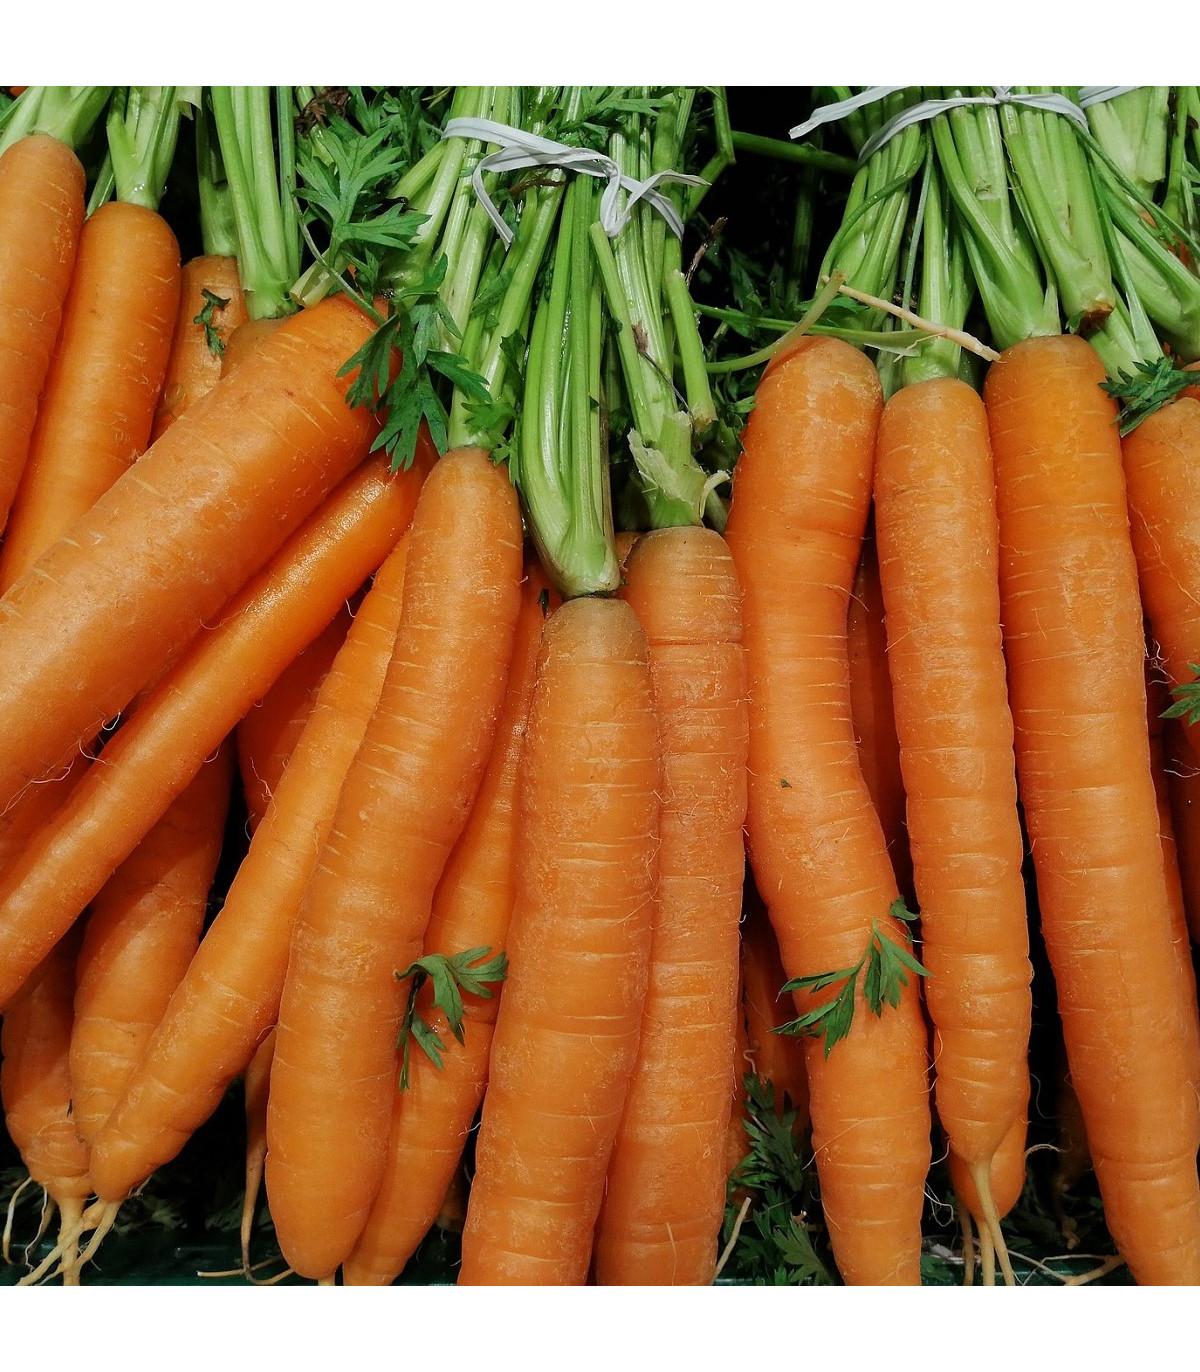 Mrkev letní Juwarot - Daucus carota - osivo mrkve - 900 ks